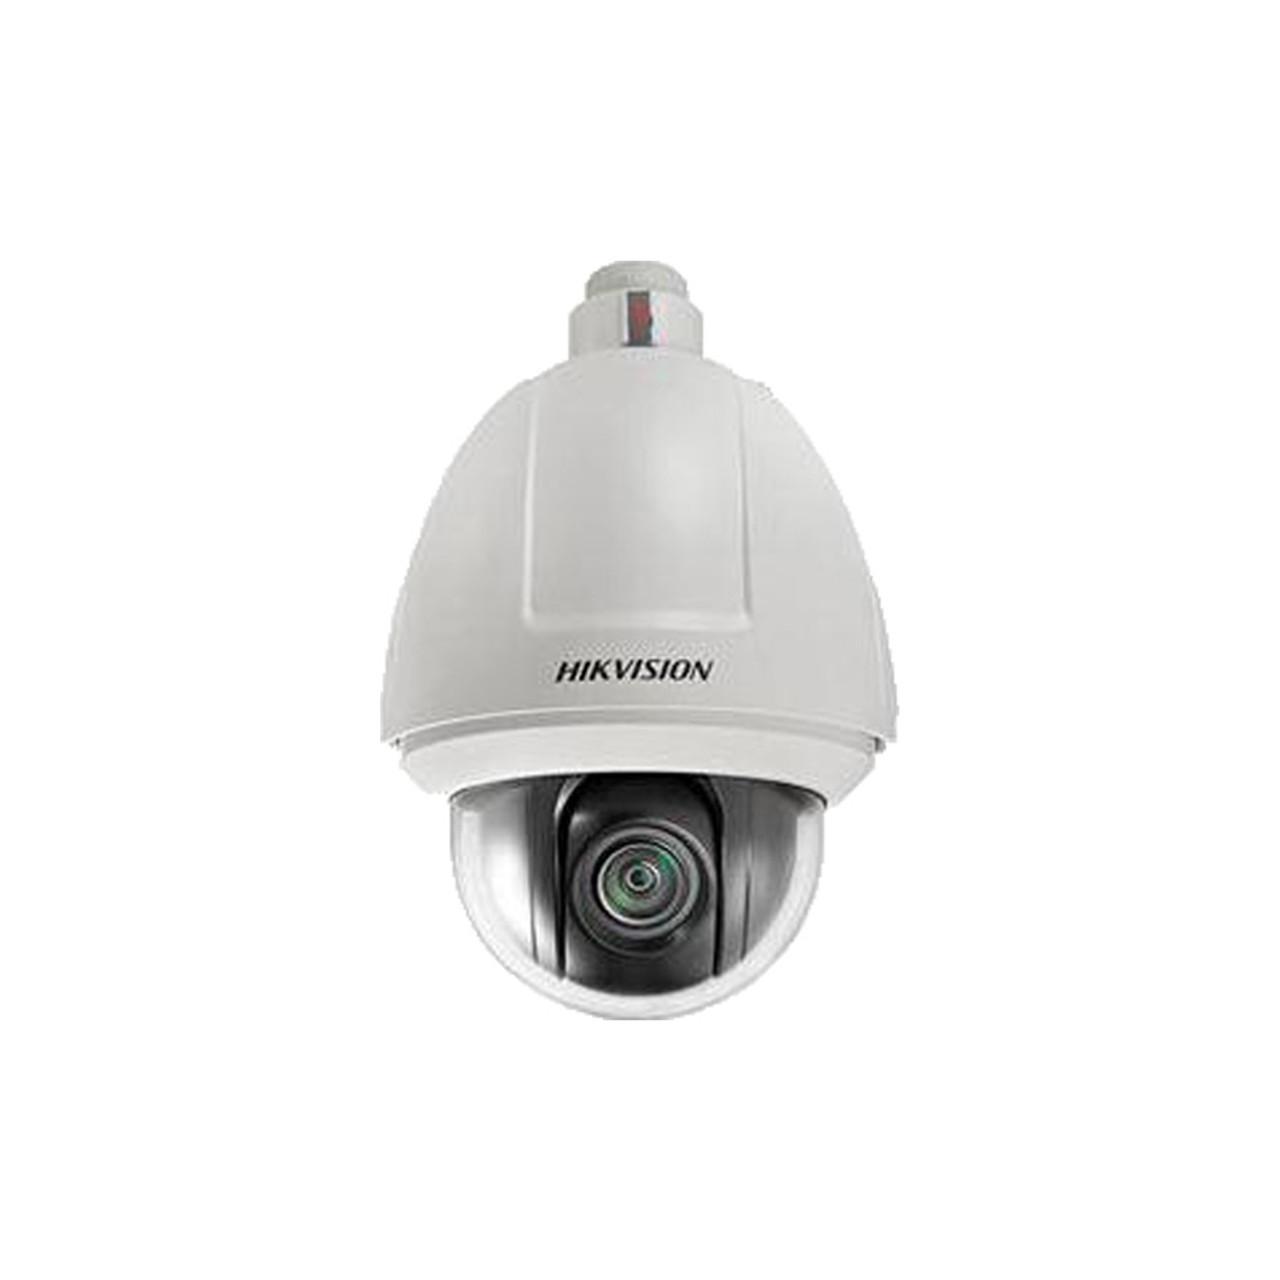 NEW HIKVISION-USA 23X Outdoor IR Hybrid IP Network//Analog PTZ Speed Dome Camera